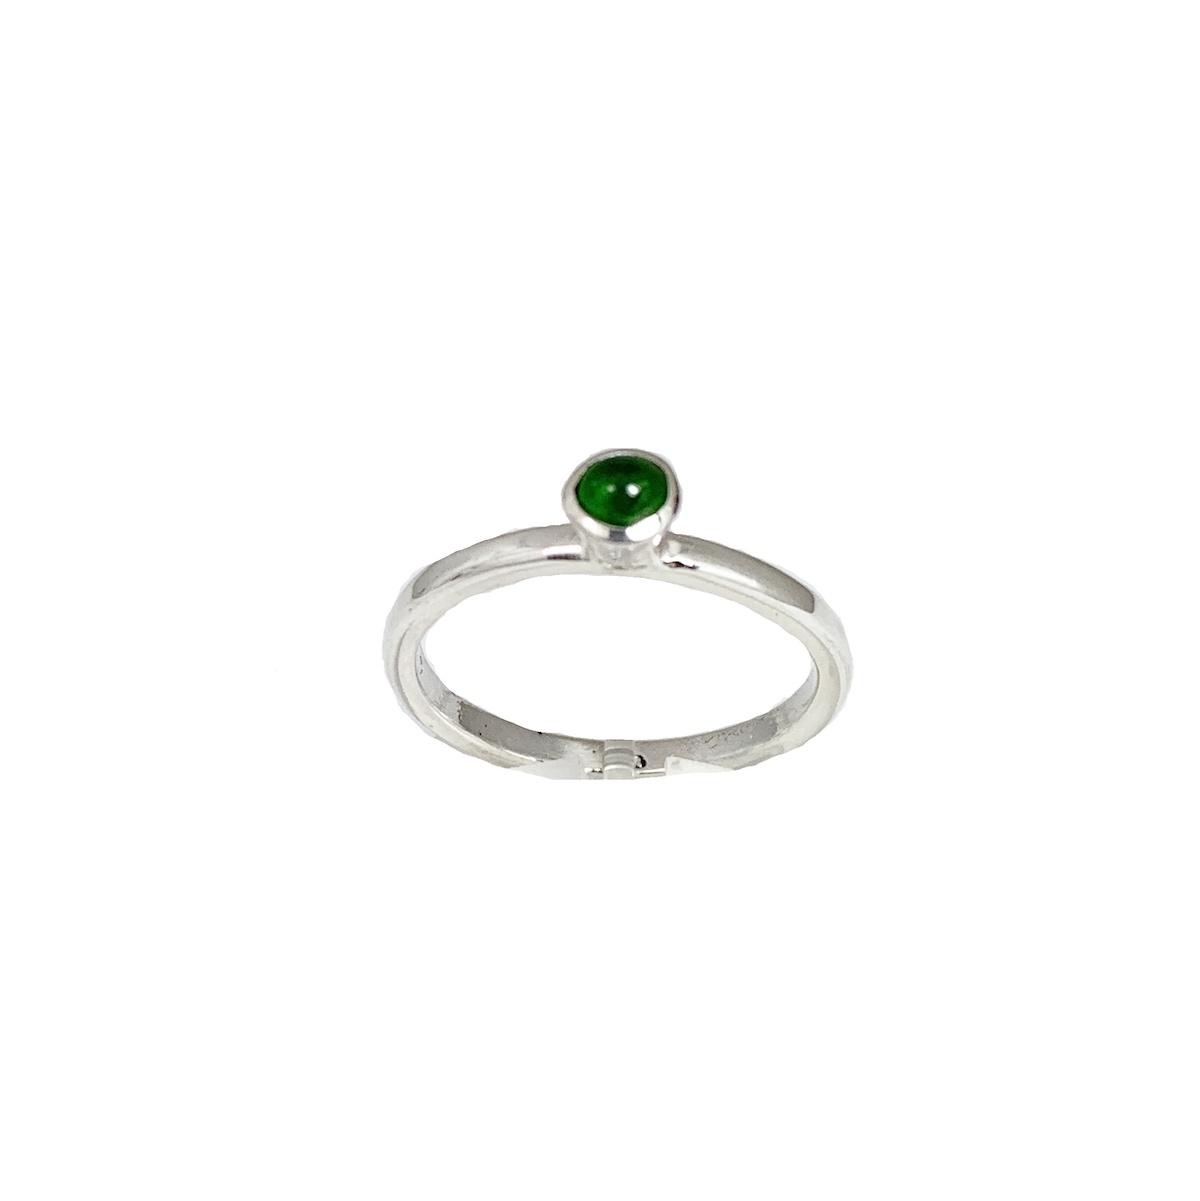 NJ Bali stack rings Green tourmaline